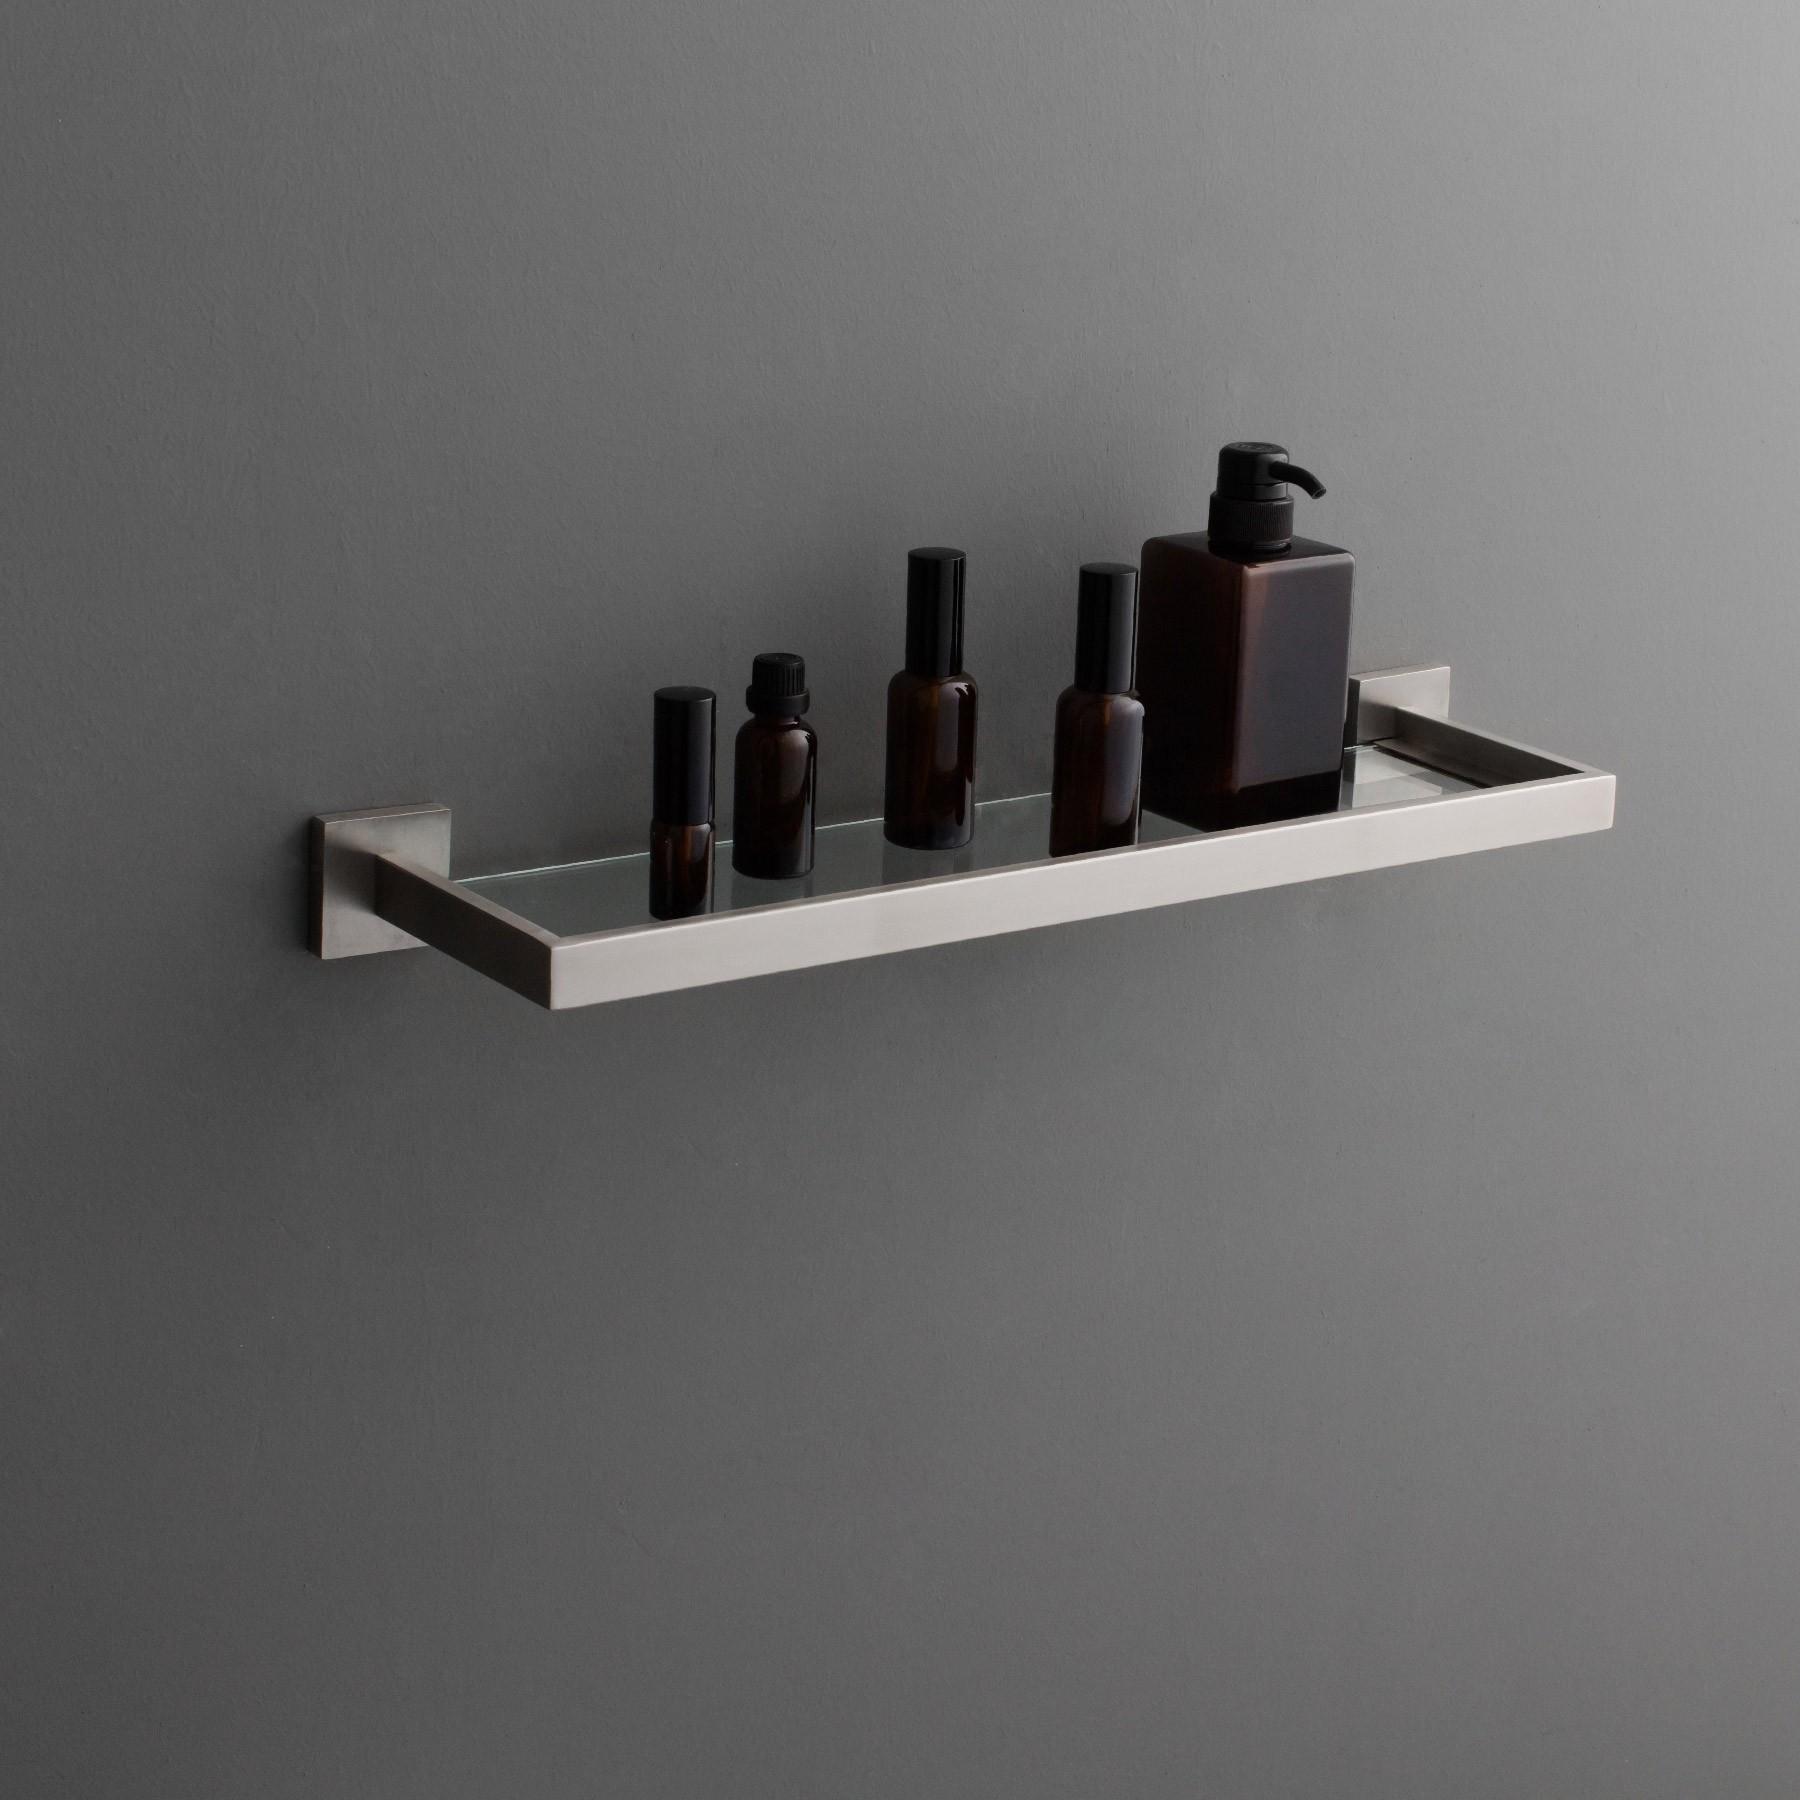 TriBeCa Bathroom Floating Glass Wall Shelf, Brushed Nickel